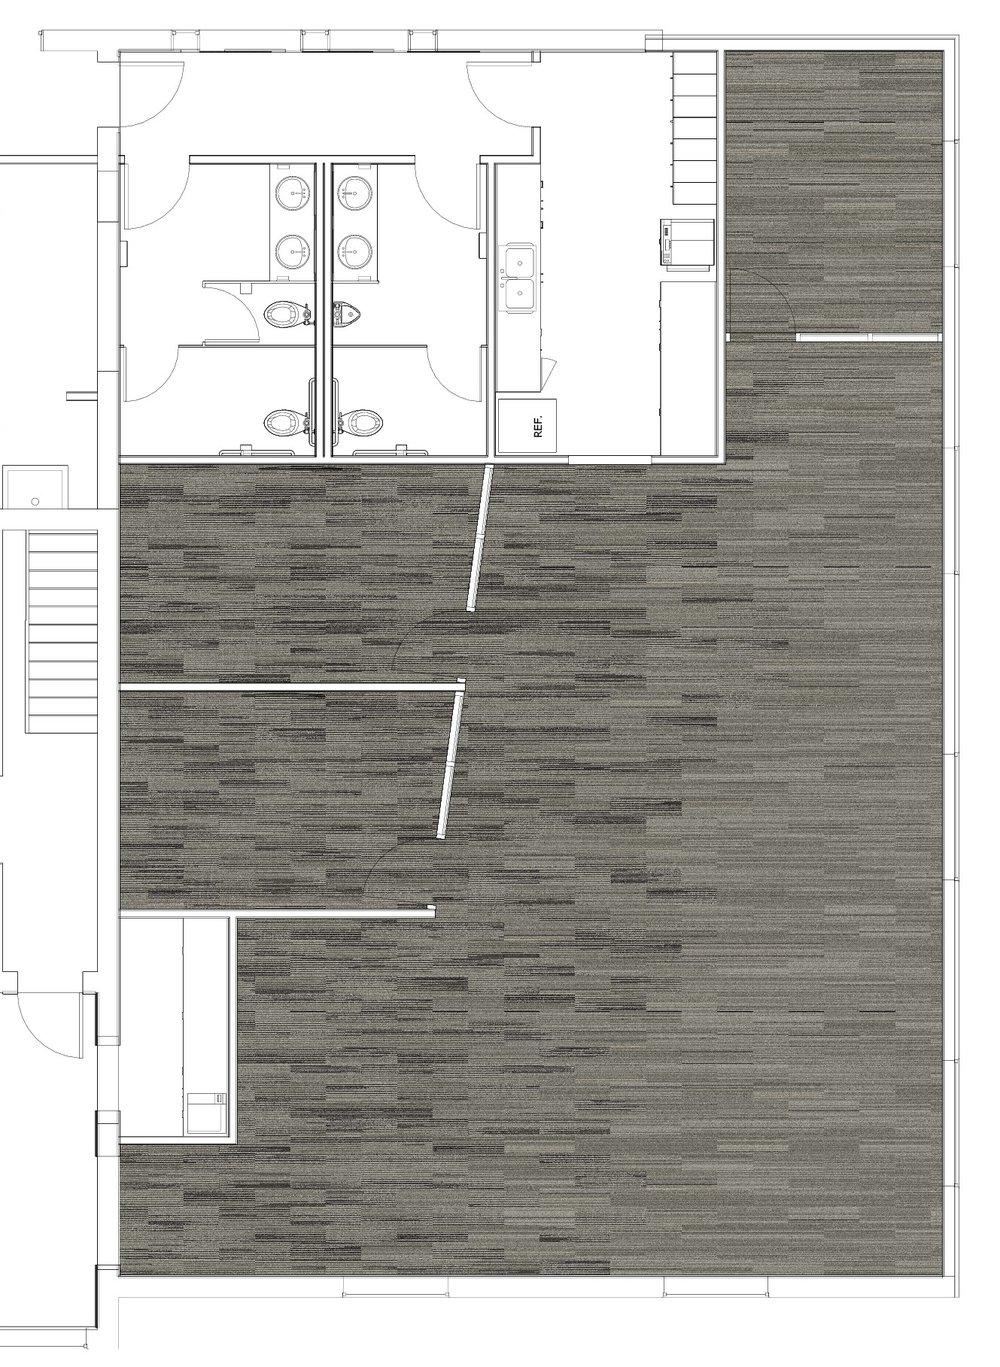 Rinehart Realty - Custom Carpet Fade Pattern